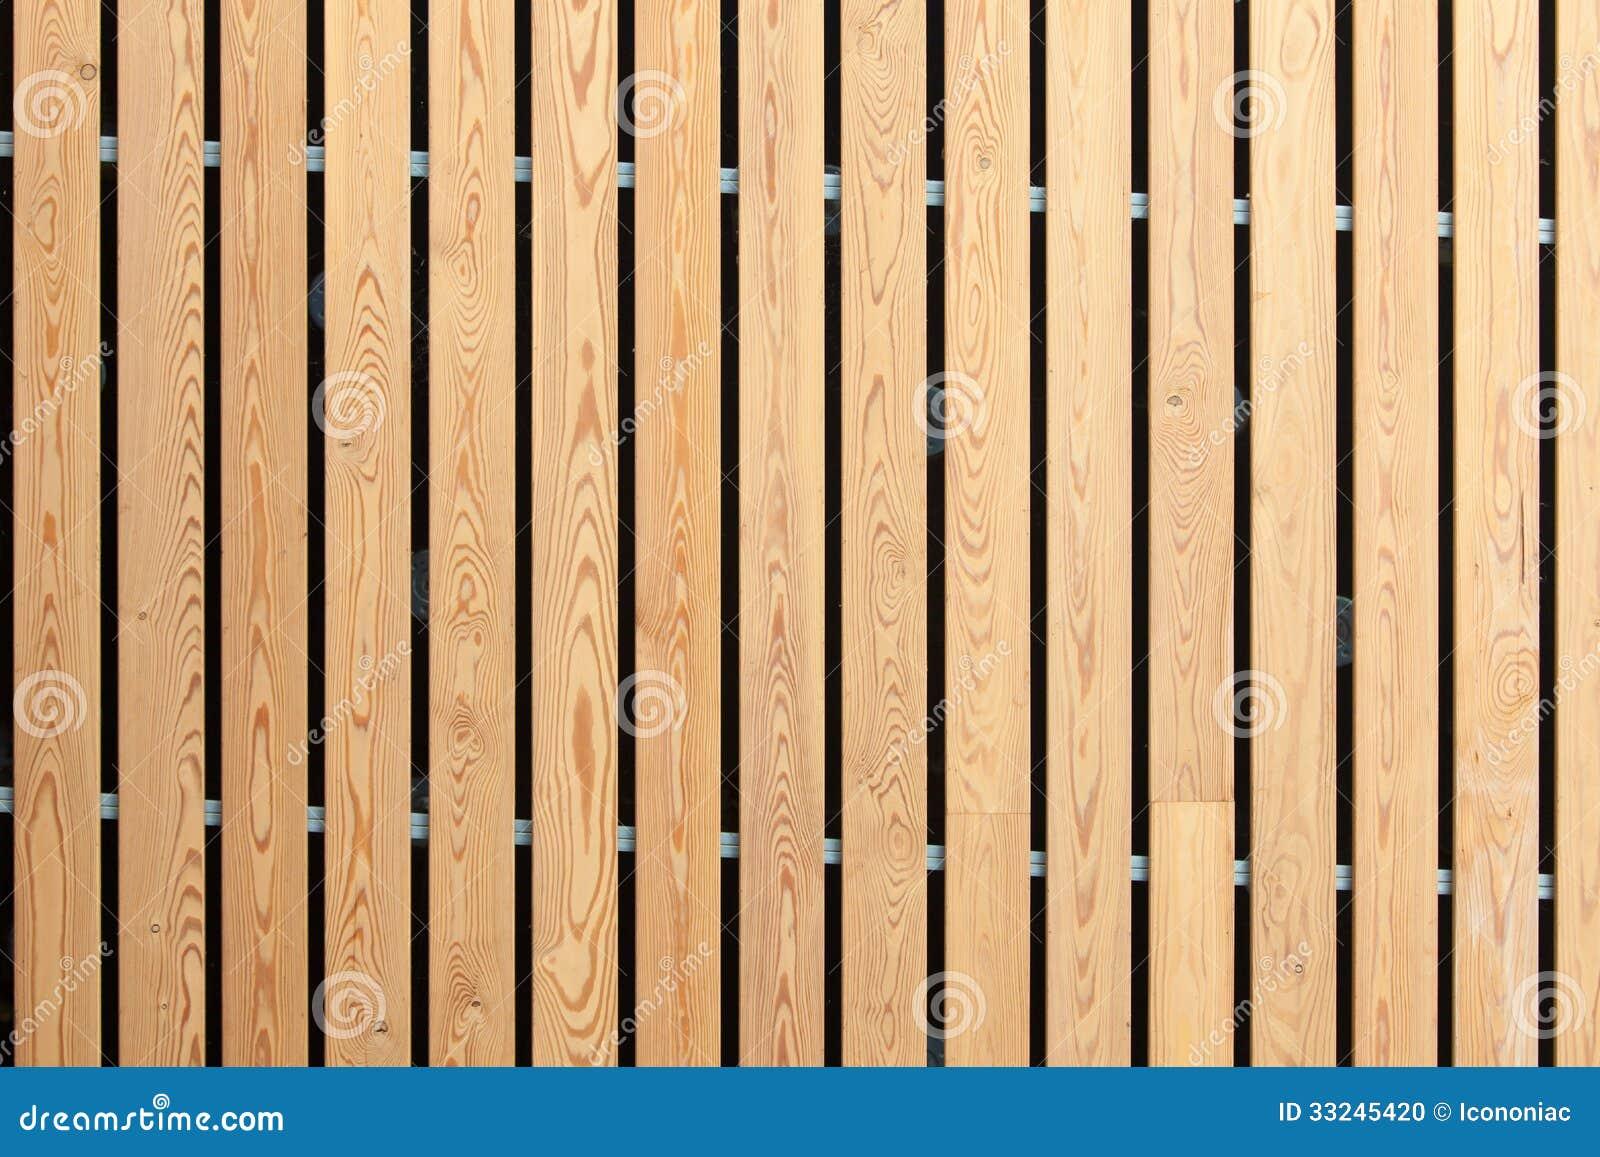 wood cladding wallpaper